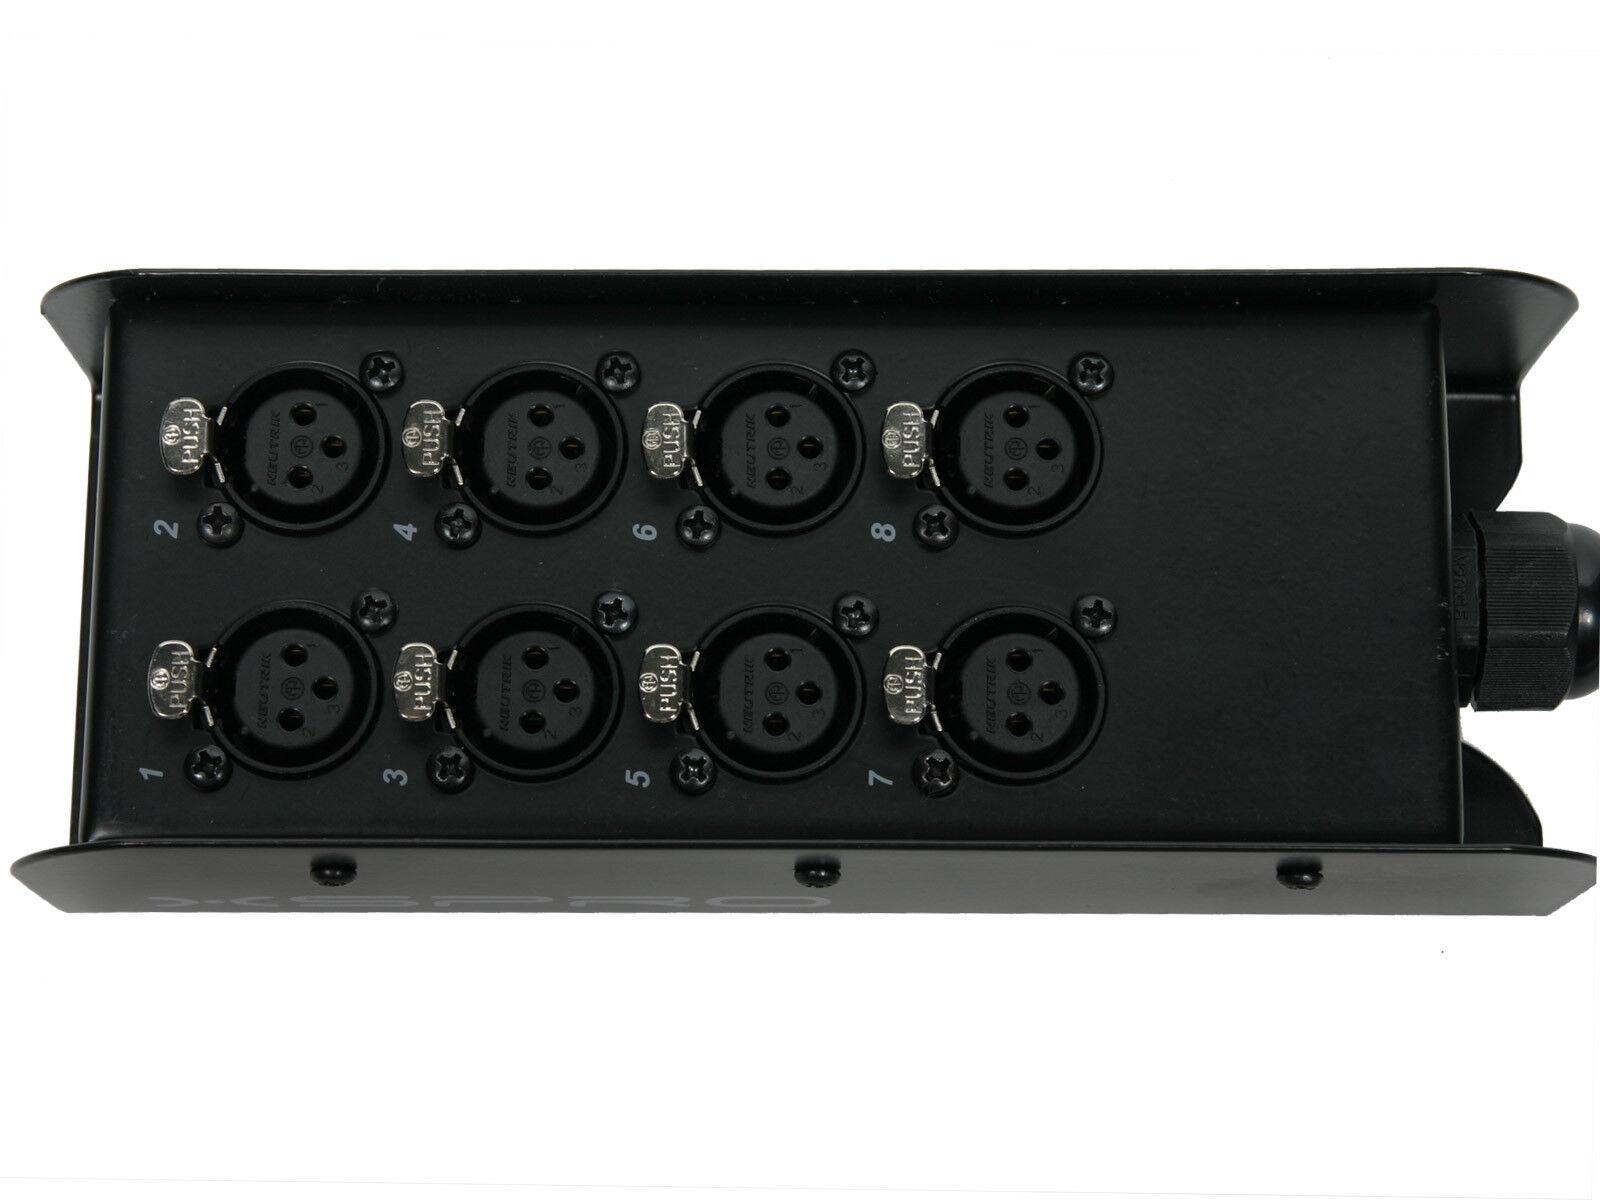 XSPRO 8 Channel 30/' Pro Audio Low Profile Snake 8x30